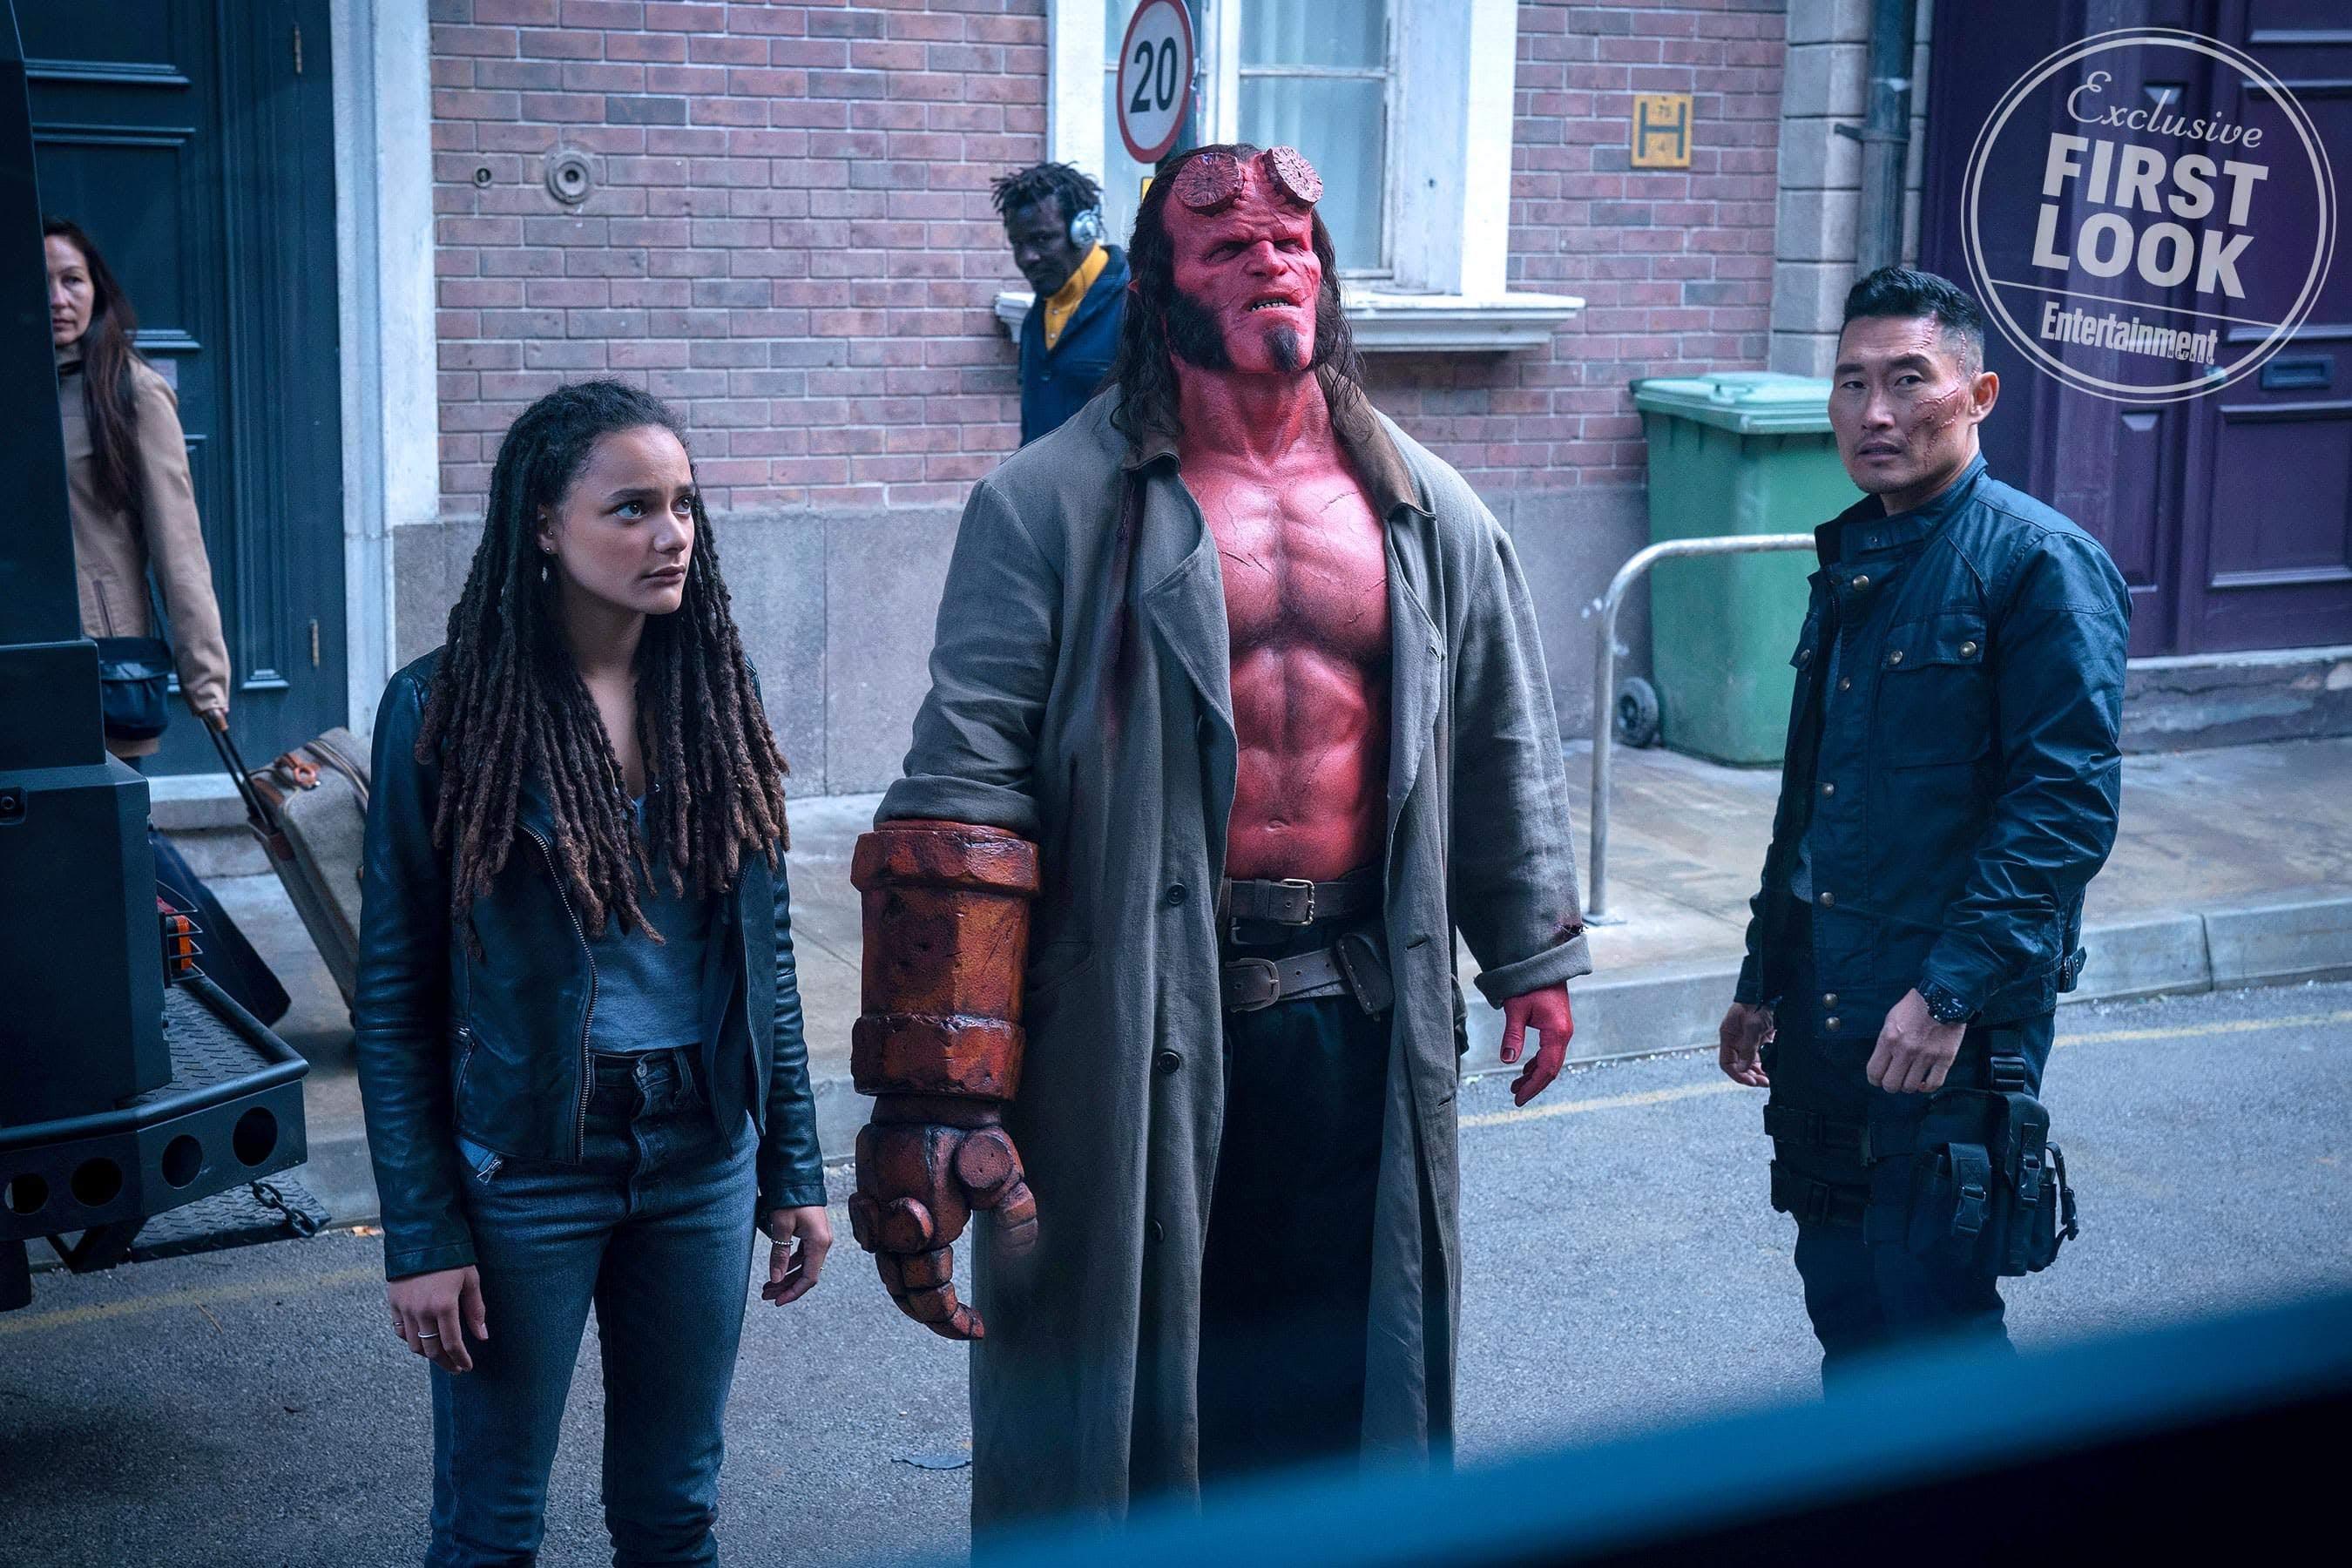 Hellboy : デヴィッド・ハーバー主演の新しい「ヘルボーイ」を配給するライオンズゲートが、告知した明日の予告編の初公開を今日とカン違いした失敗により、前倒しの1日早い公式リリース ! !